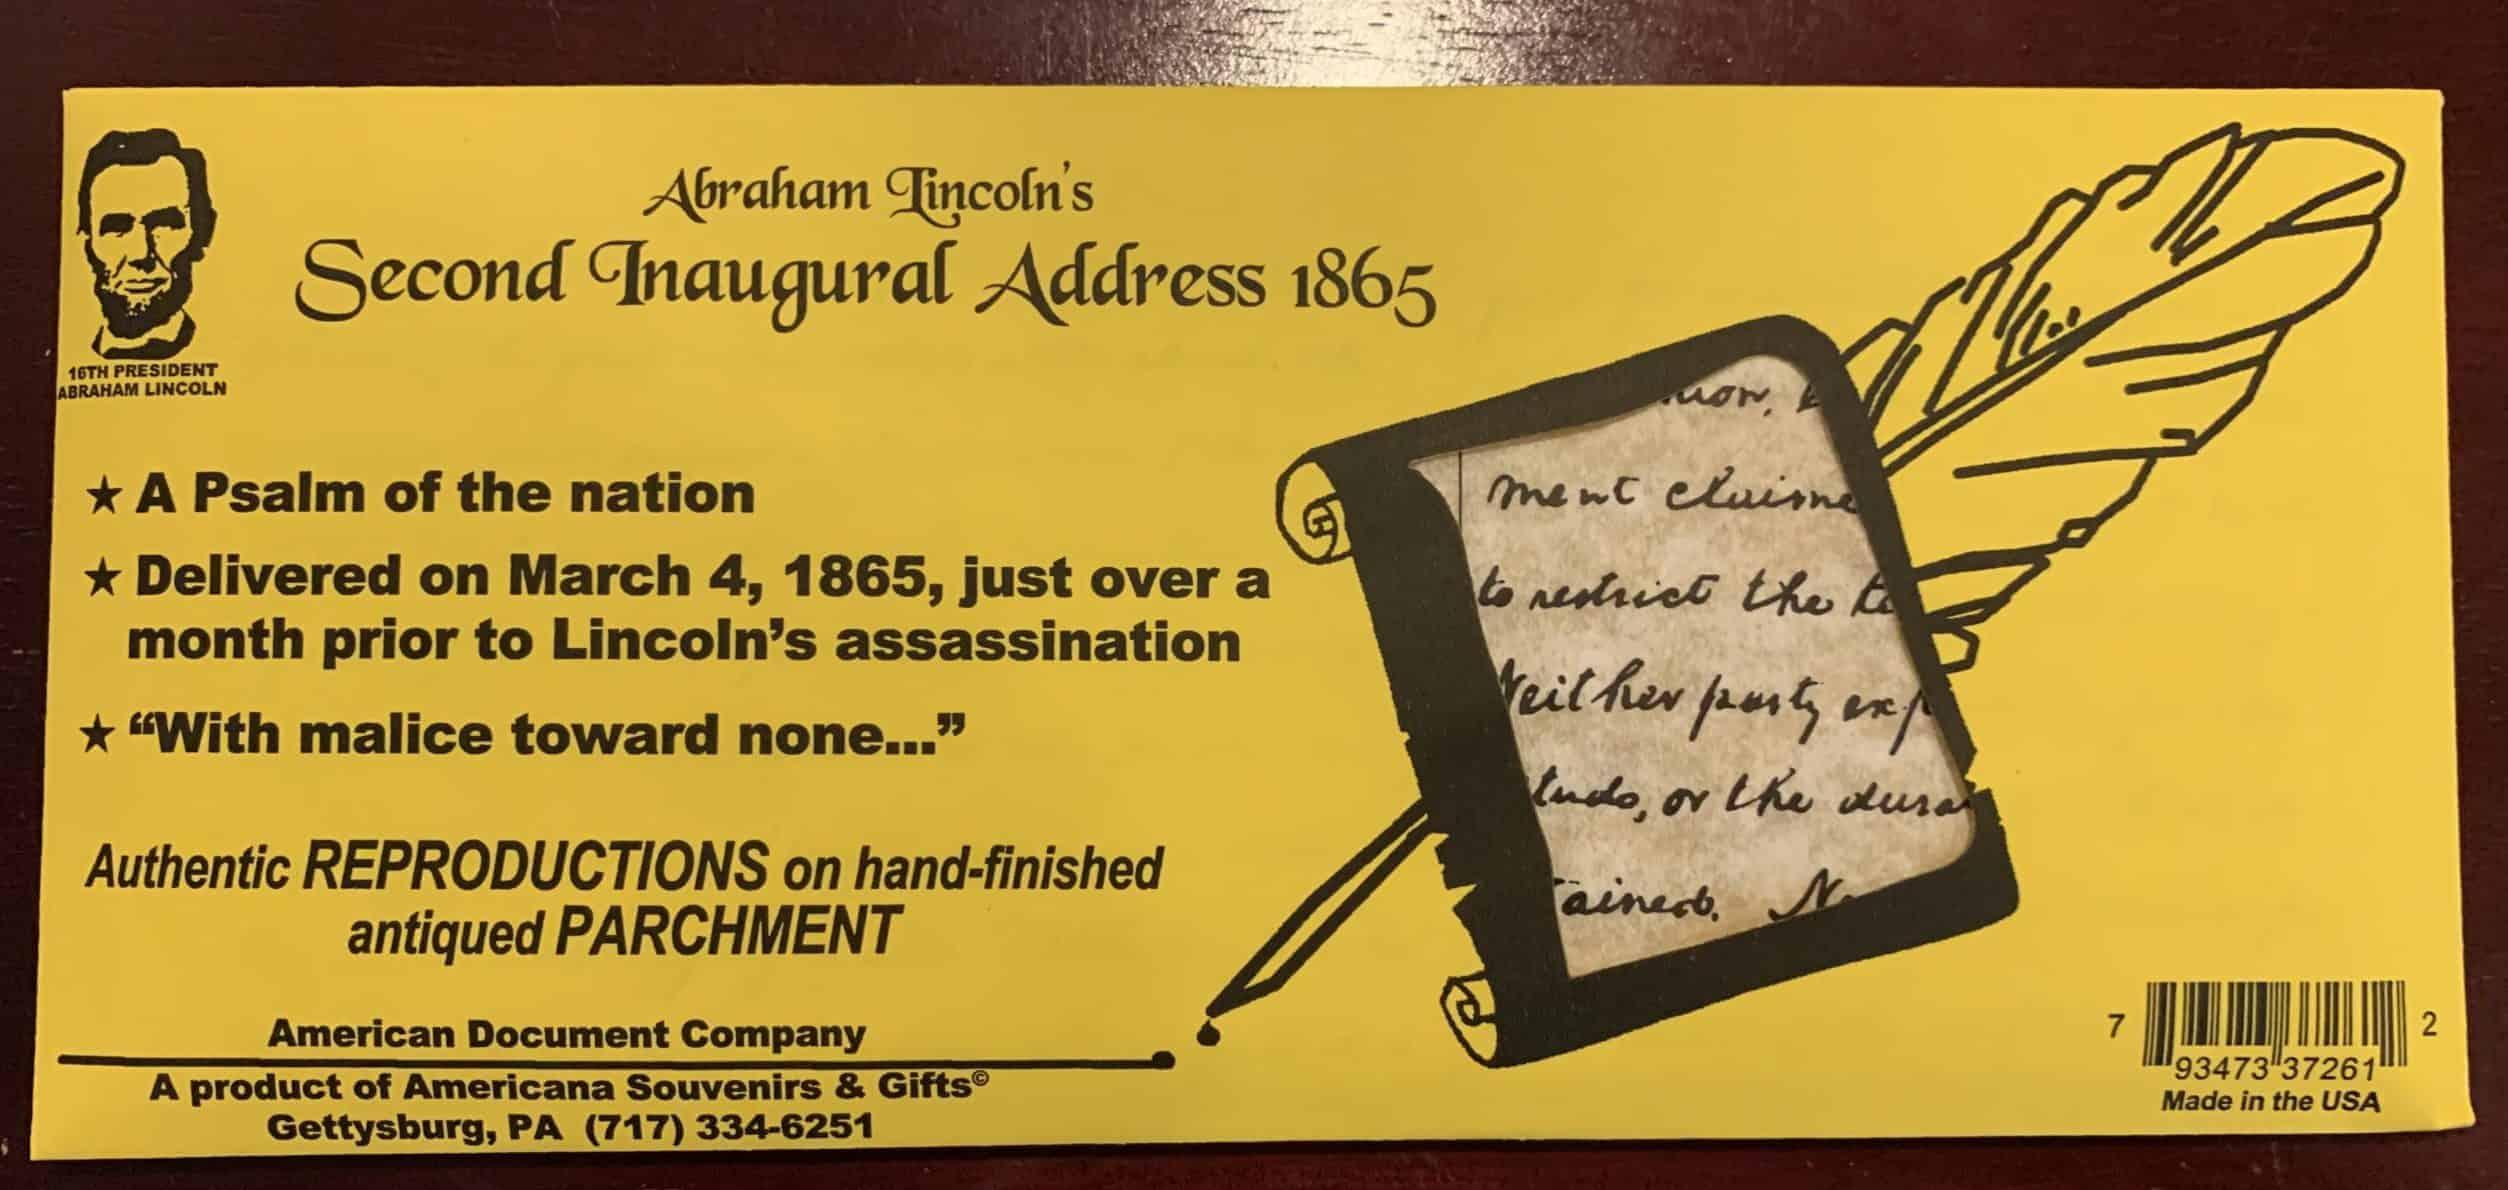 Abraham Lincoln's Second Inaugural Address Parchment replica